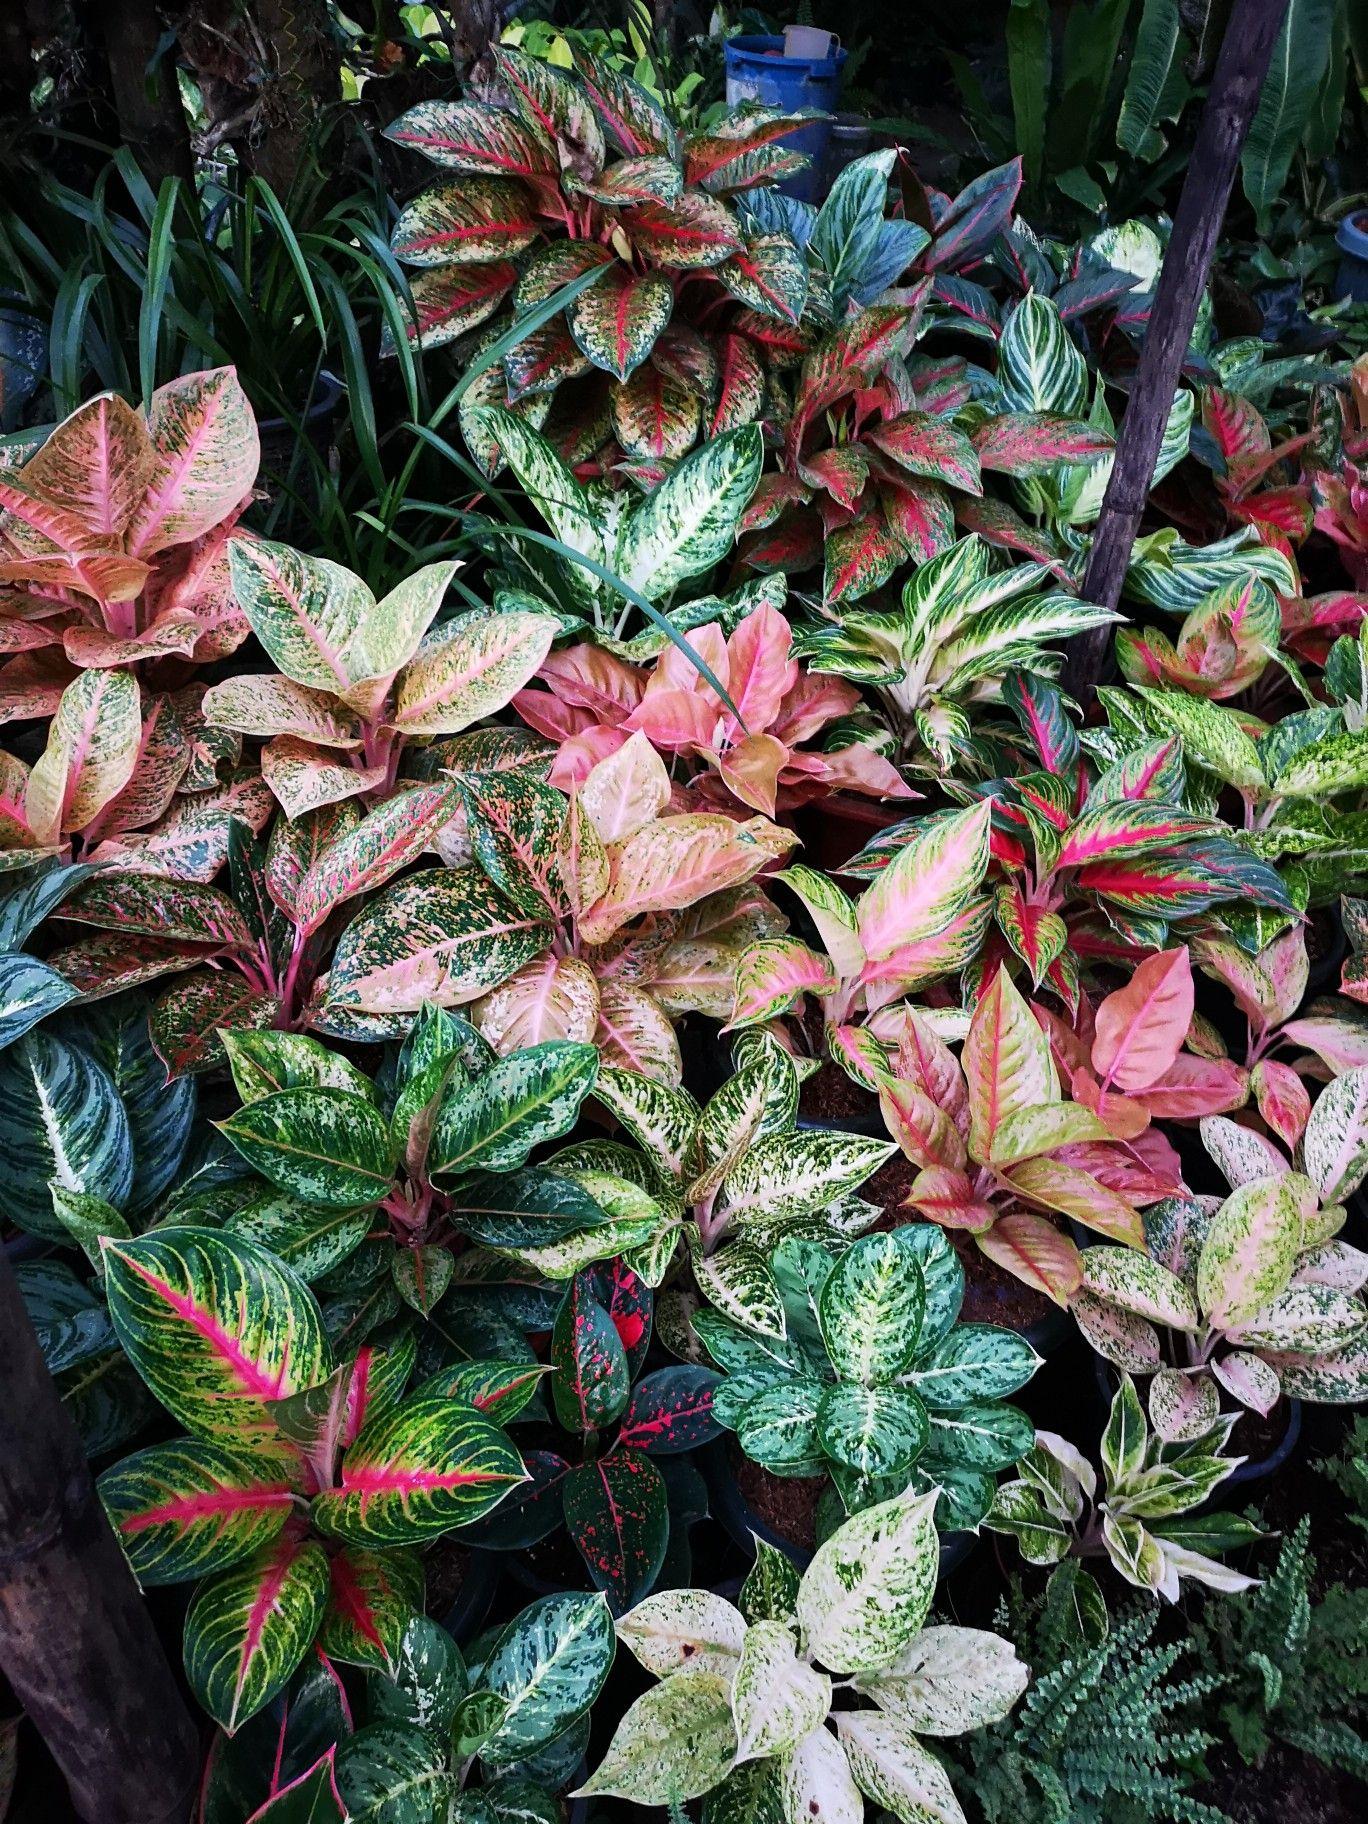 Aglaonemas Flowering Vine Plants Foliage Plants Trees To Plant